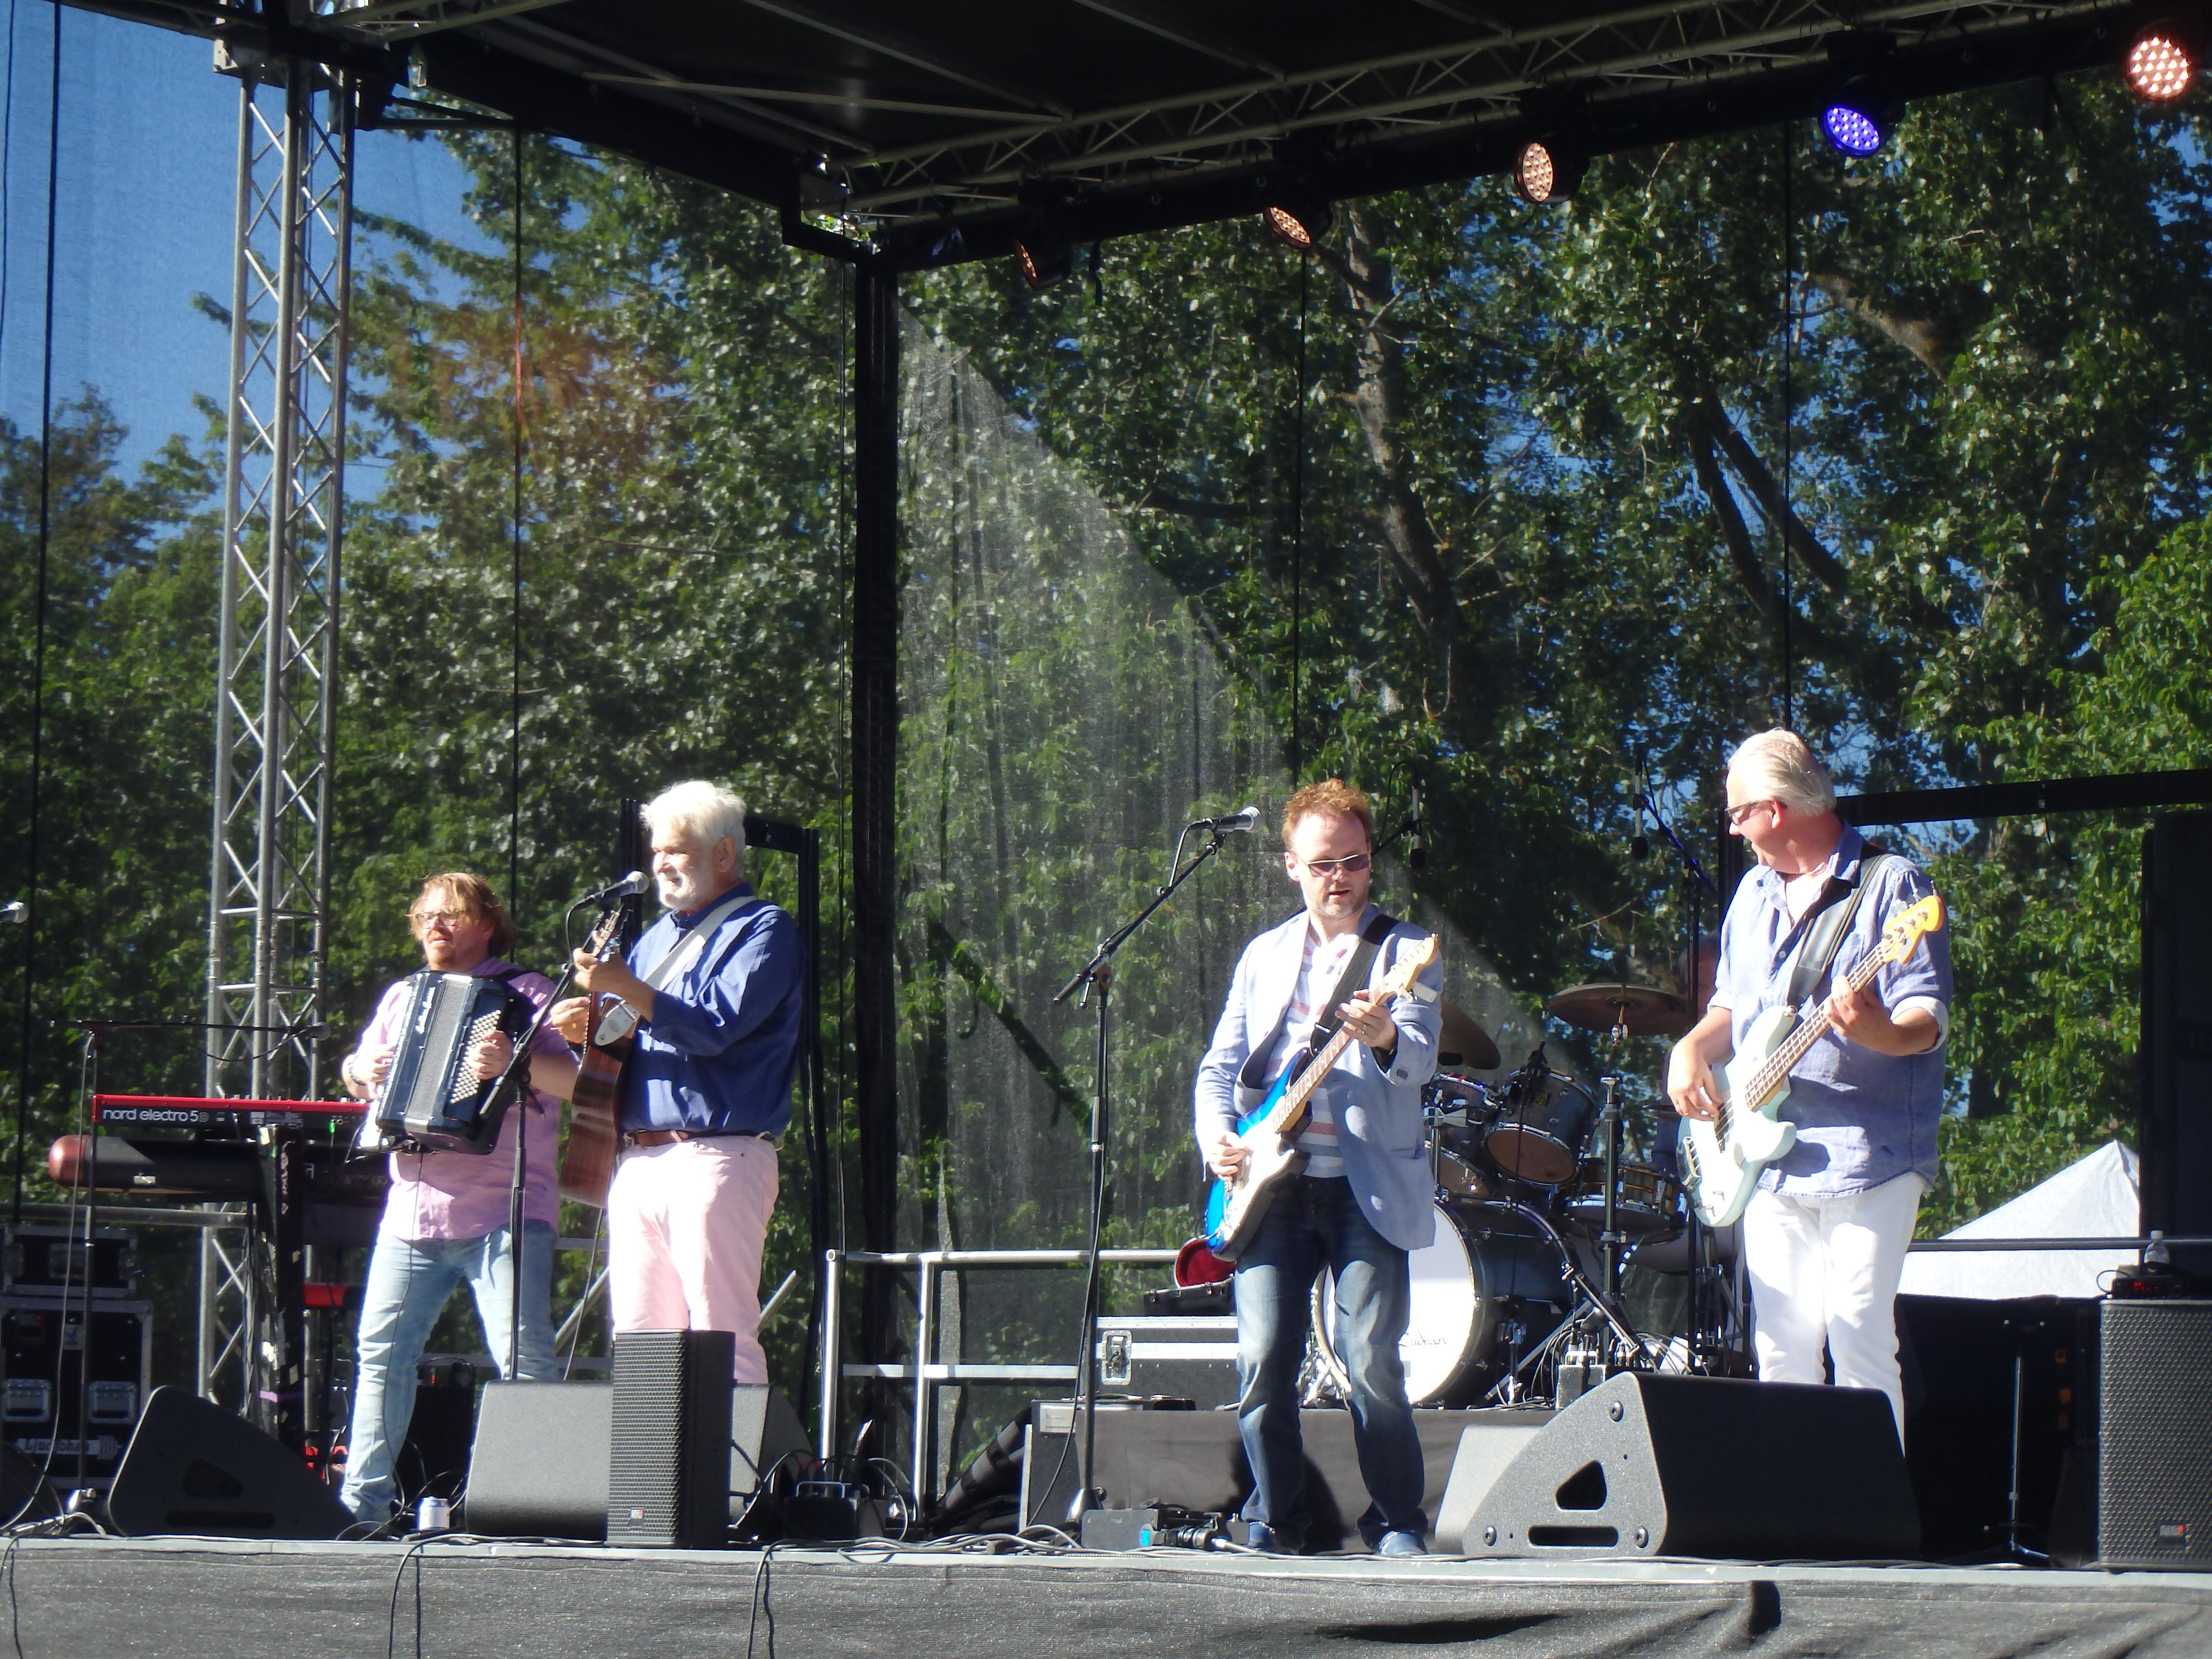 Hasse och Kvinnaböske band - Foto: Belinda Graham